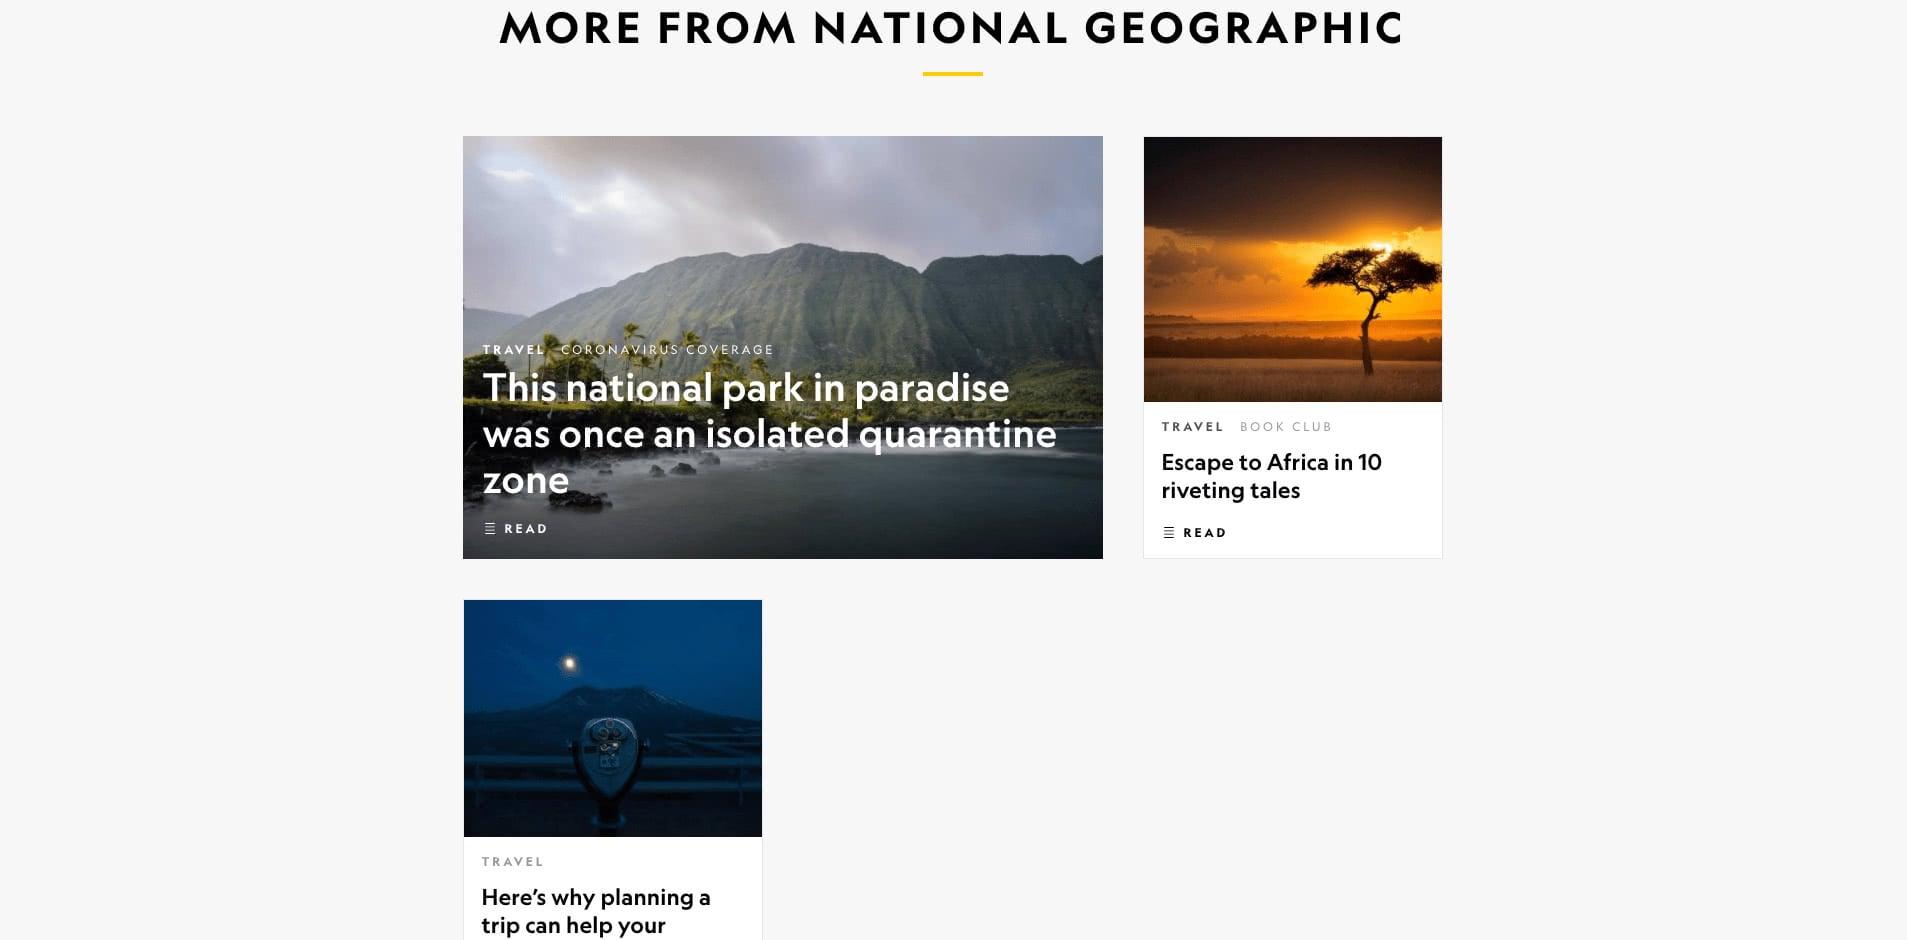 NatGeo National Geographic website